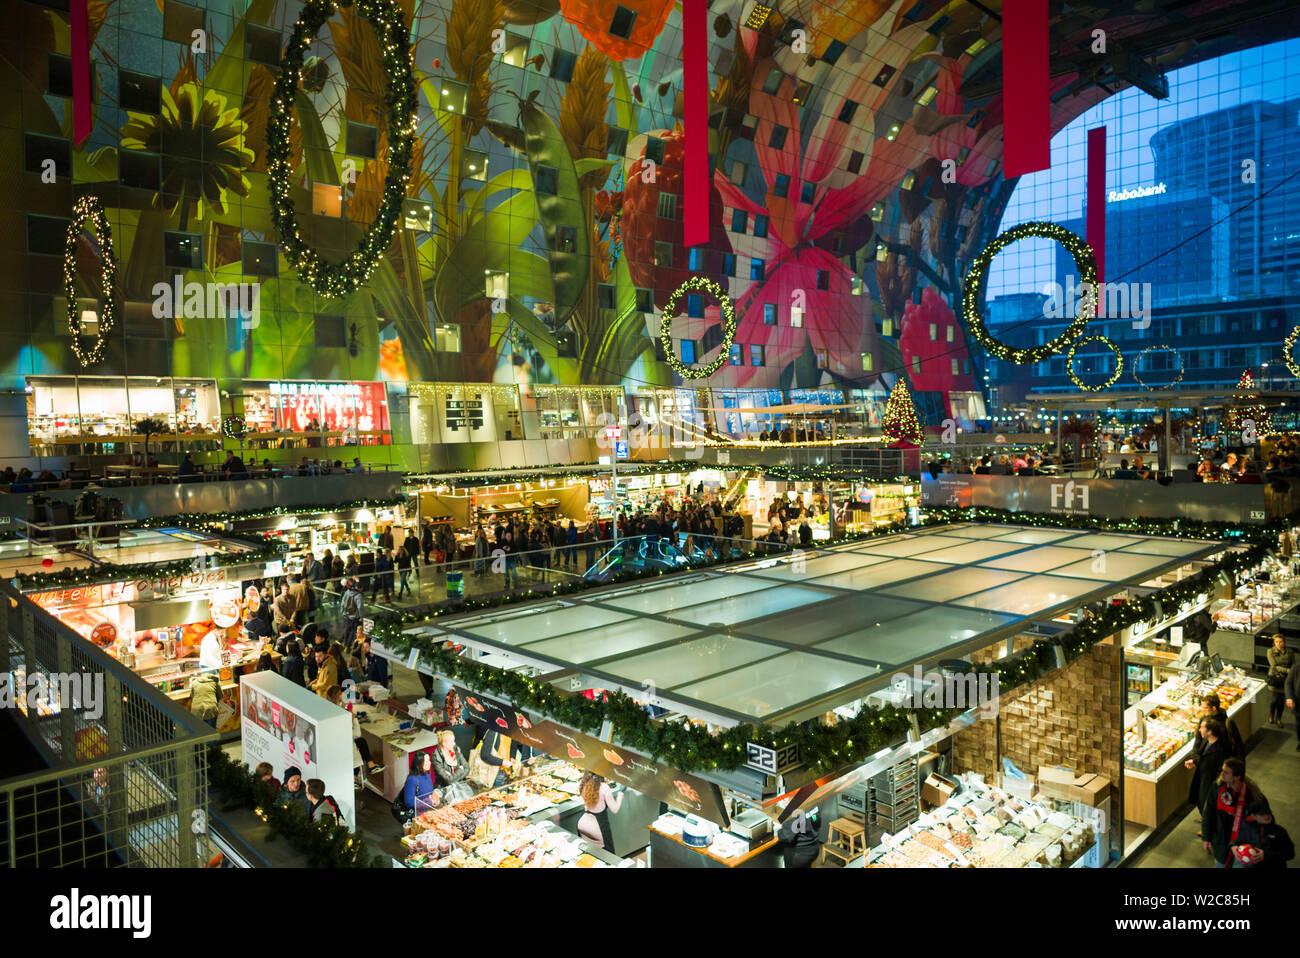 Netherlands, Rotterdam, Markthal foodhall, elevated interior view Stock Photo